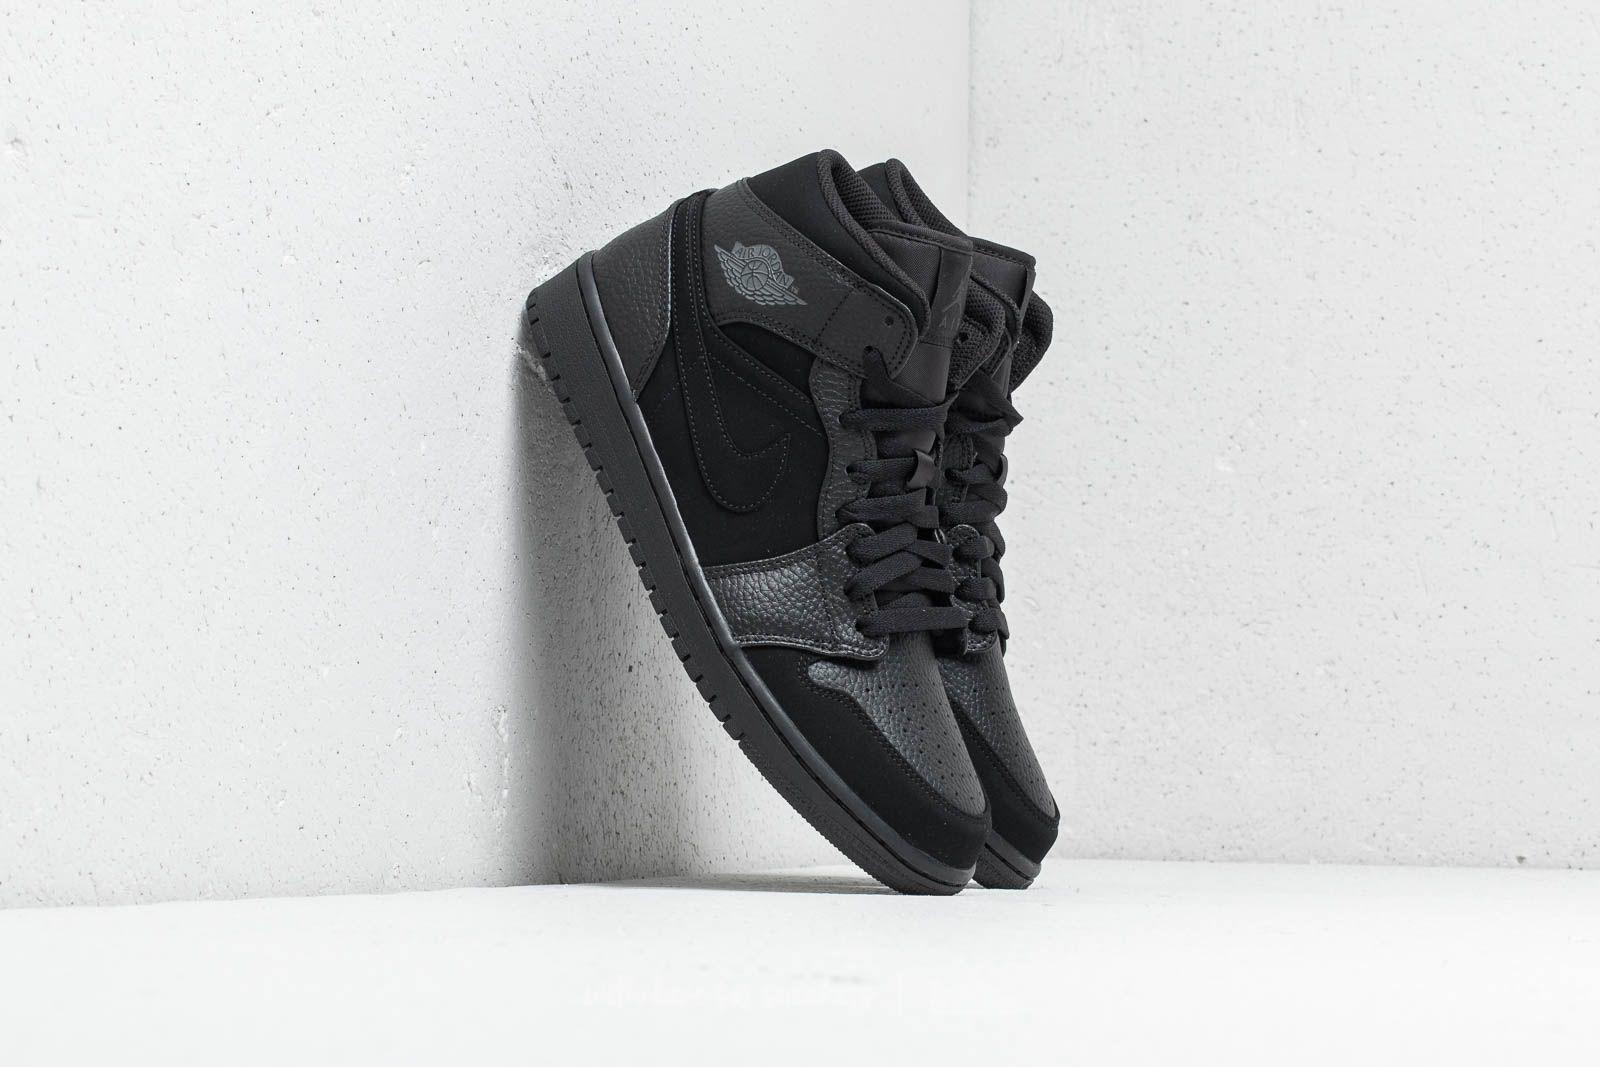 new style d8fef 52b5c Air Jordan 1 Mid Black/ Dark Smoke Grey-Black at a great price 110